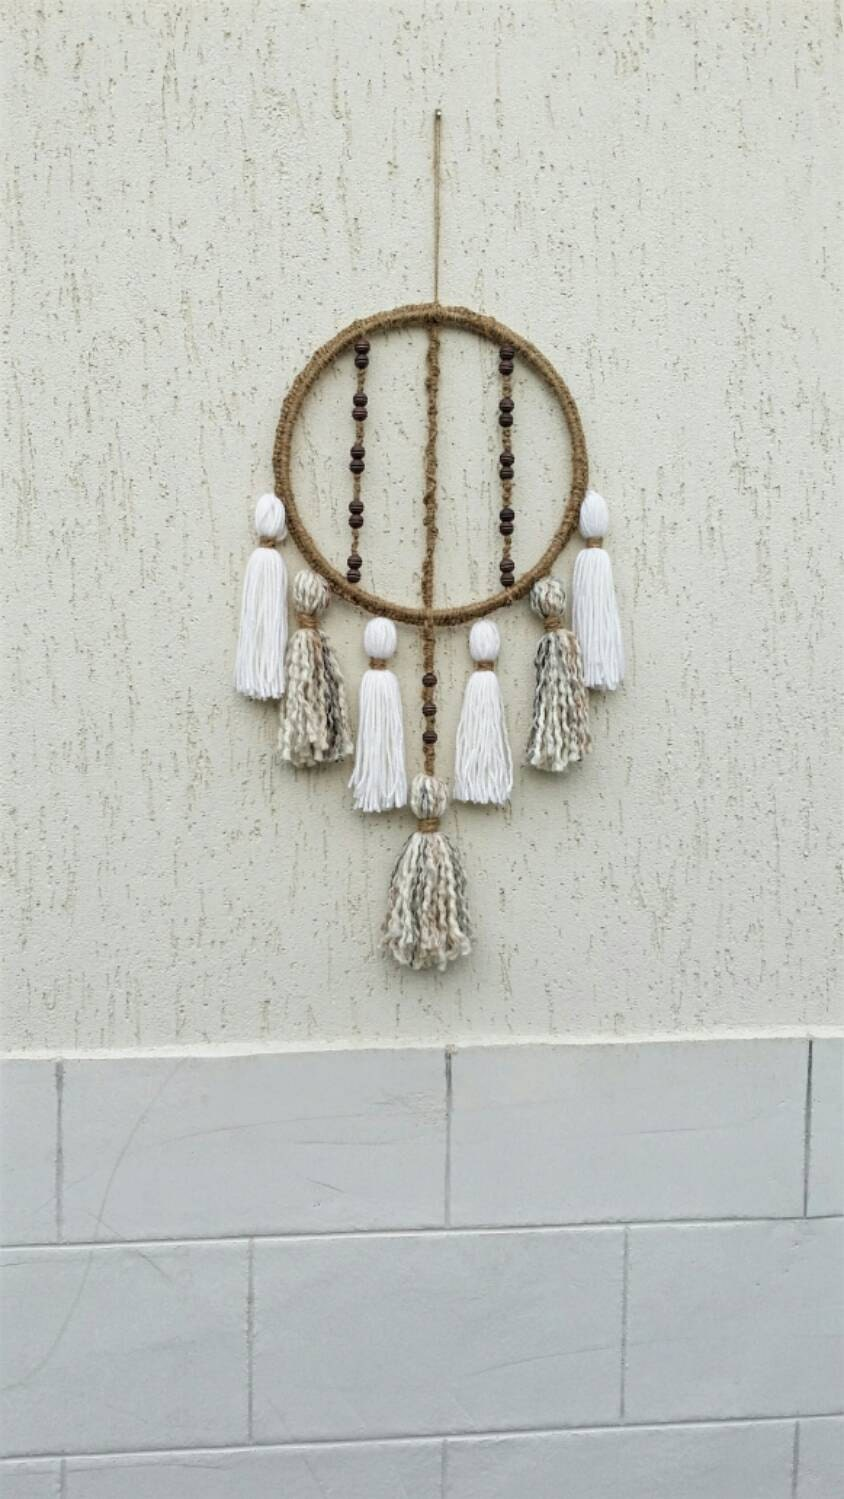 Pier One Round Wall Decor : Round macrame wall hanging bohemian d?cor tassel decor rope